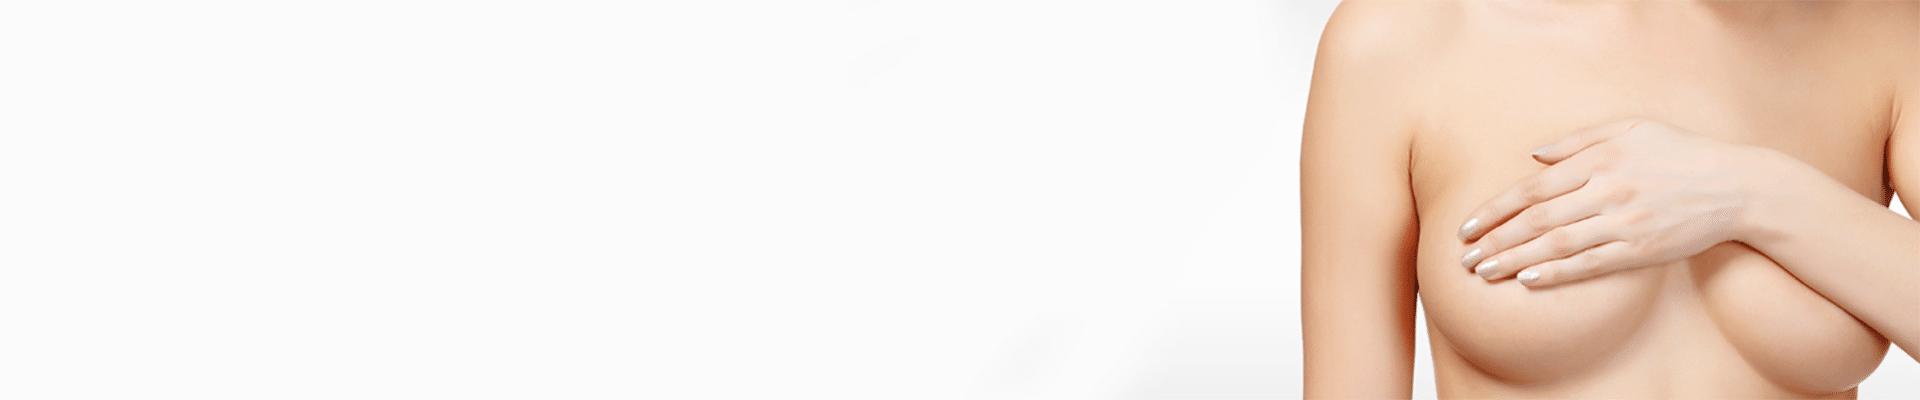 [:fr]Chirurgie seins Nabeul : Interventions poitrine pas cher[:ar]جراحة الثديين نابل: عمليات الصدر غير مكلفة[:]